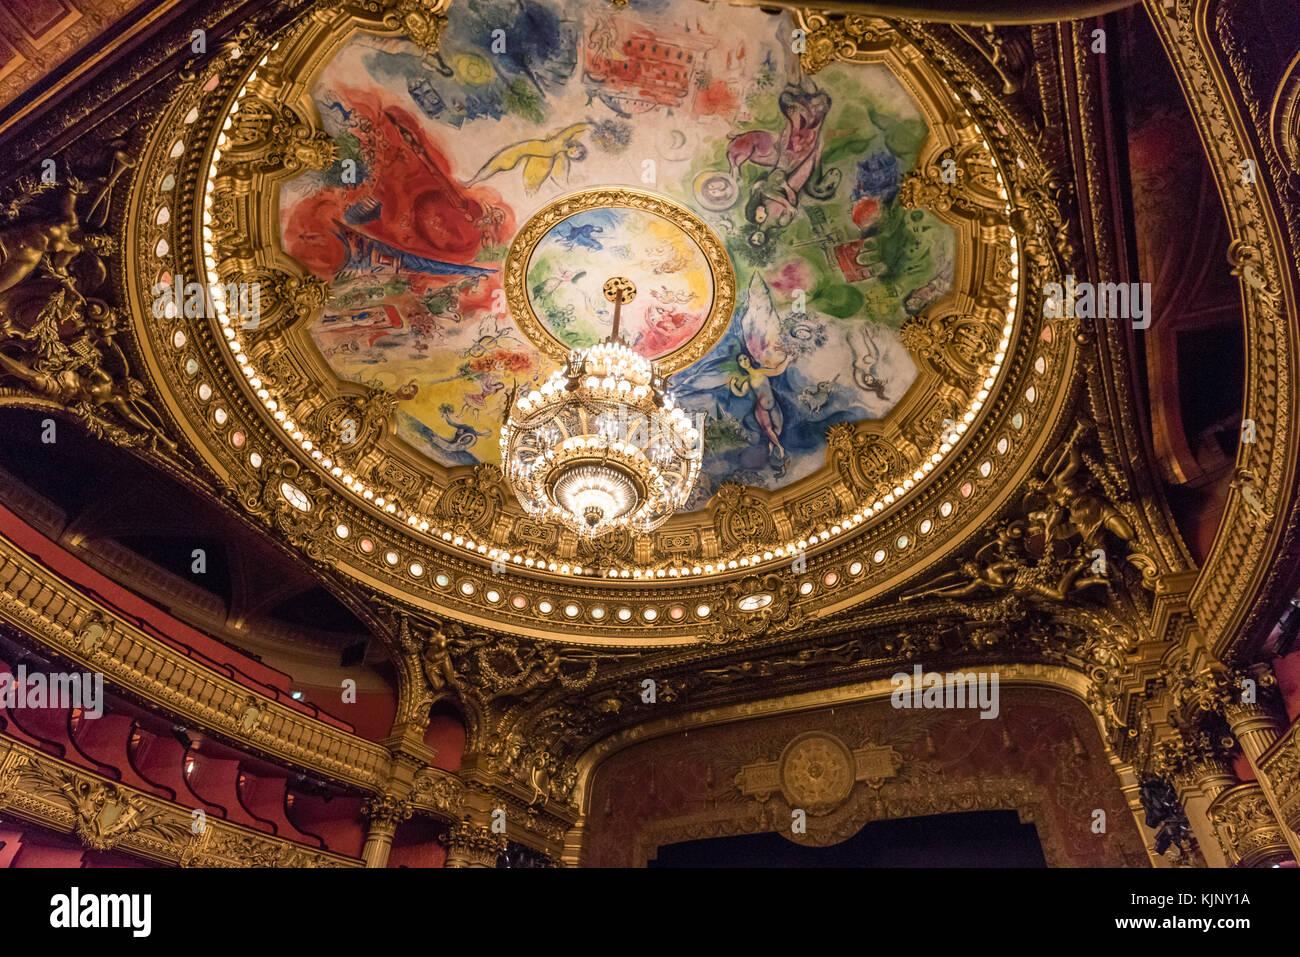 The ceiling and chandelier of the auditorium inside Palais Garnier, Paris - Stock Image